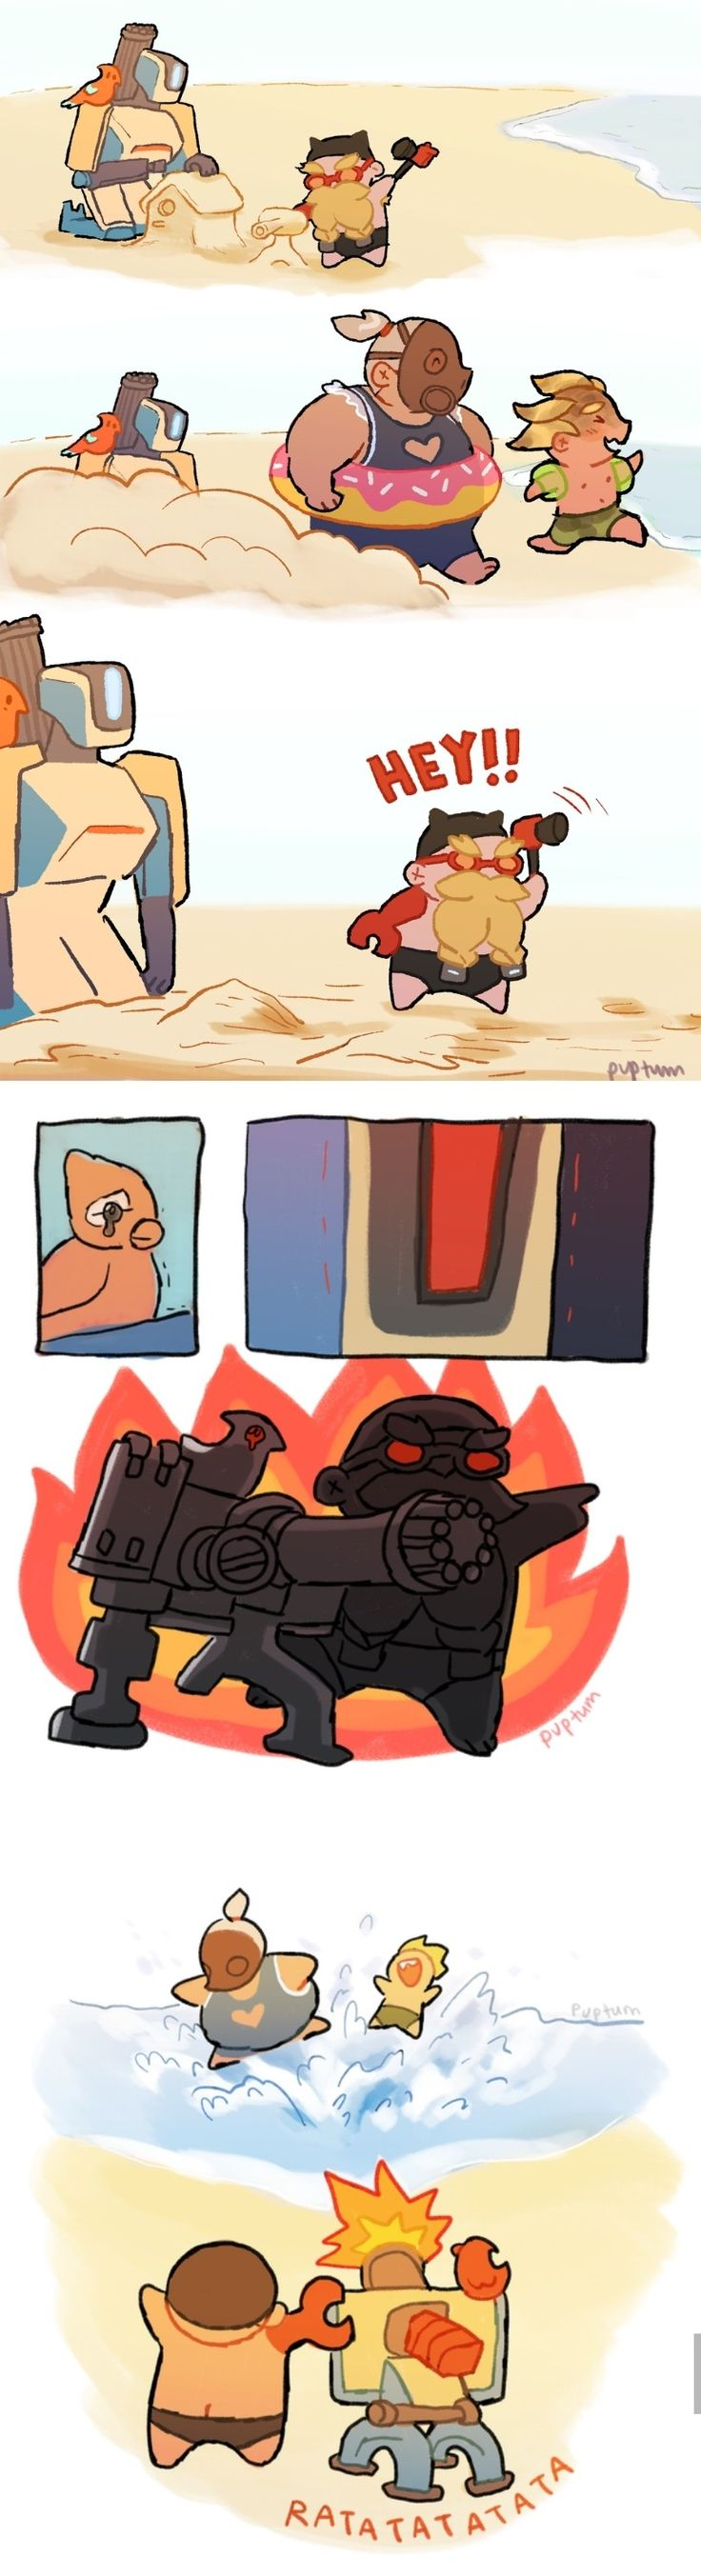 Puptum.tumblr.com